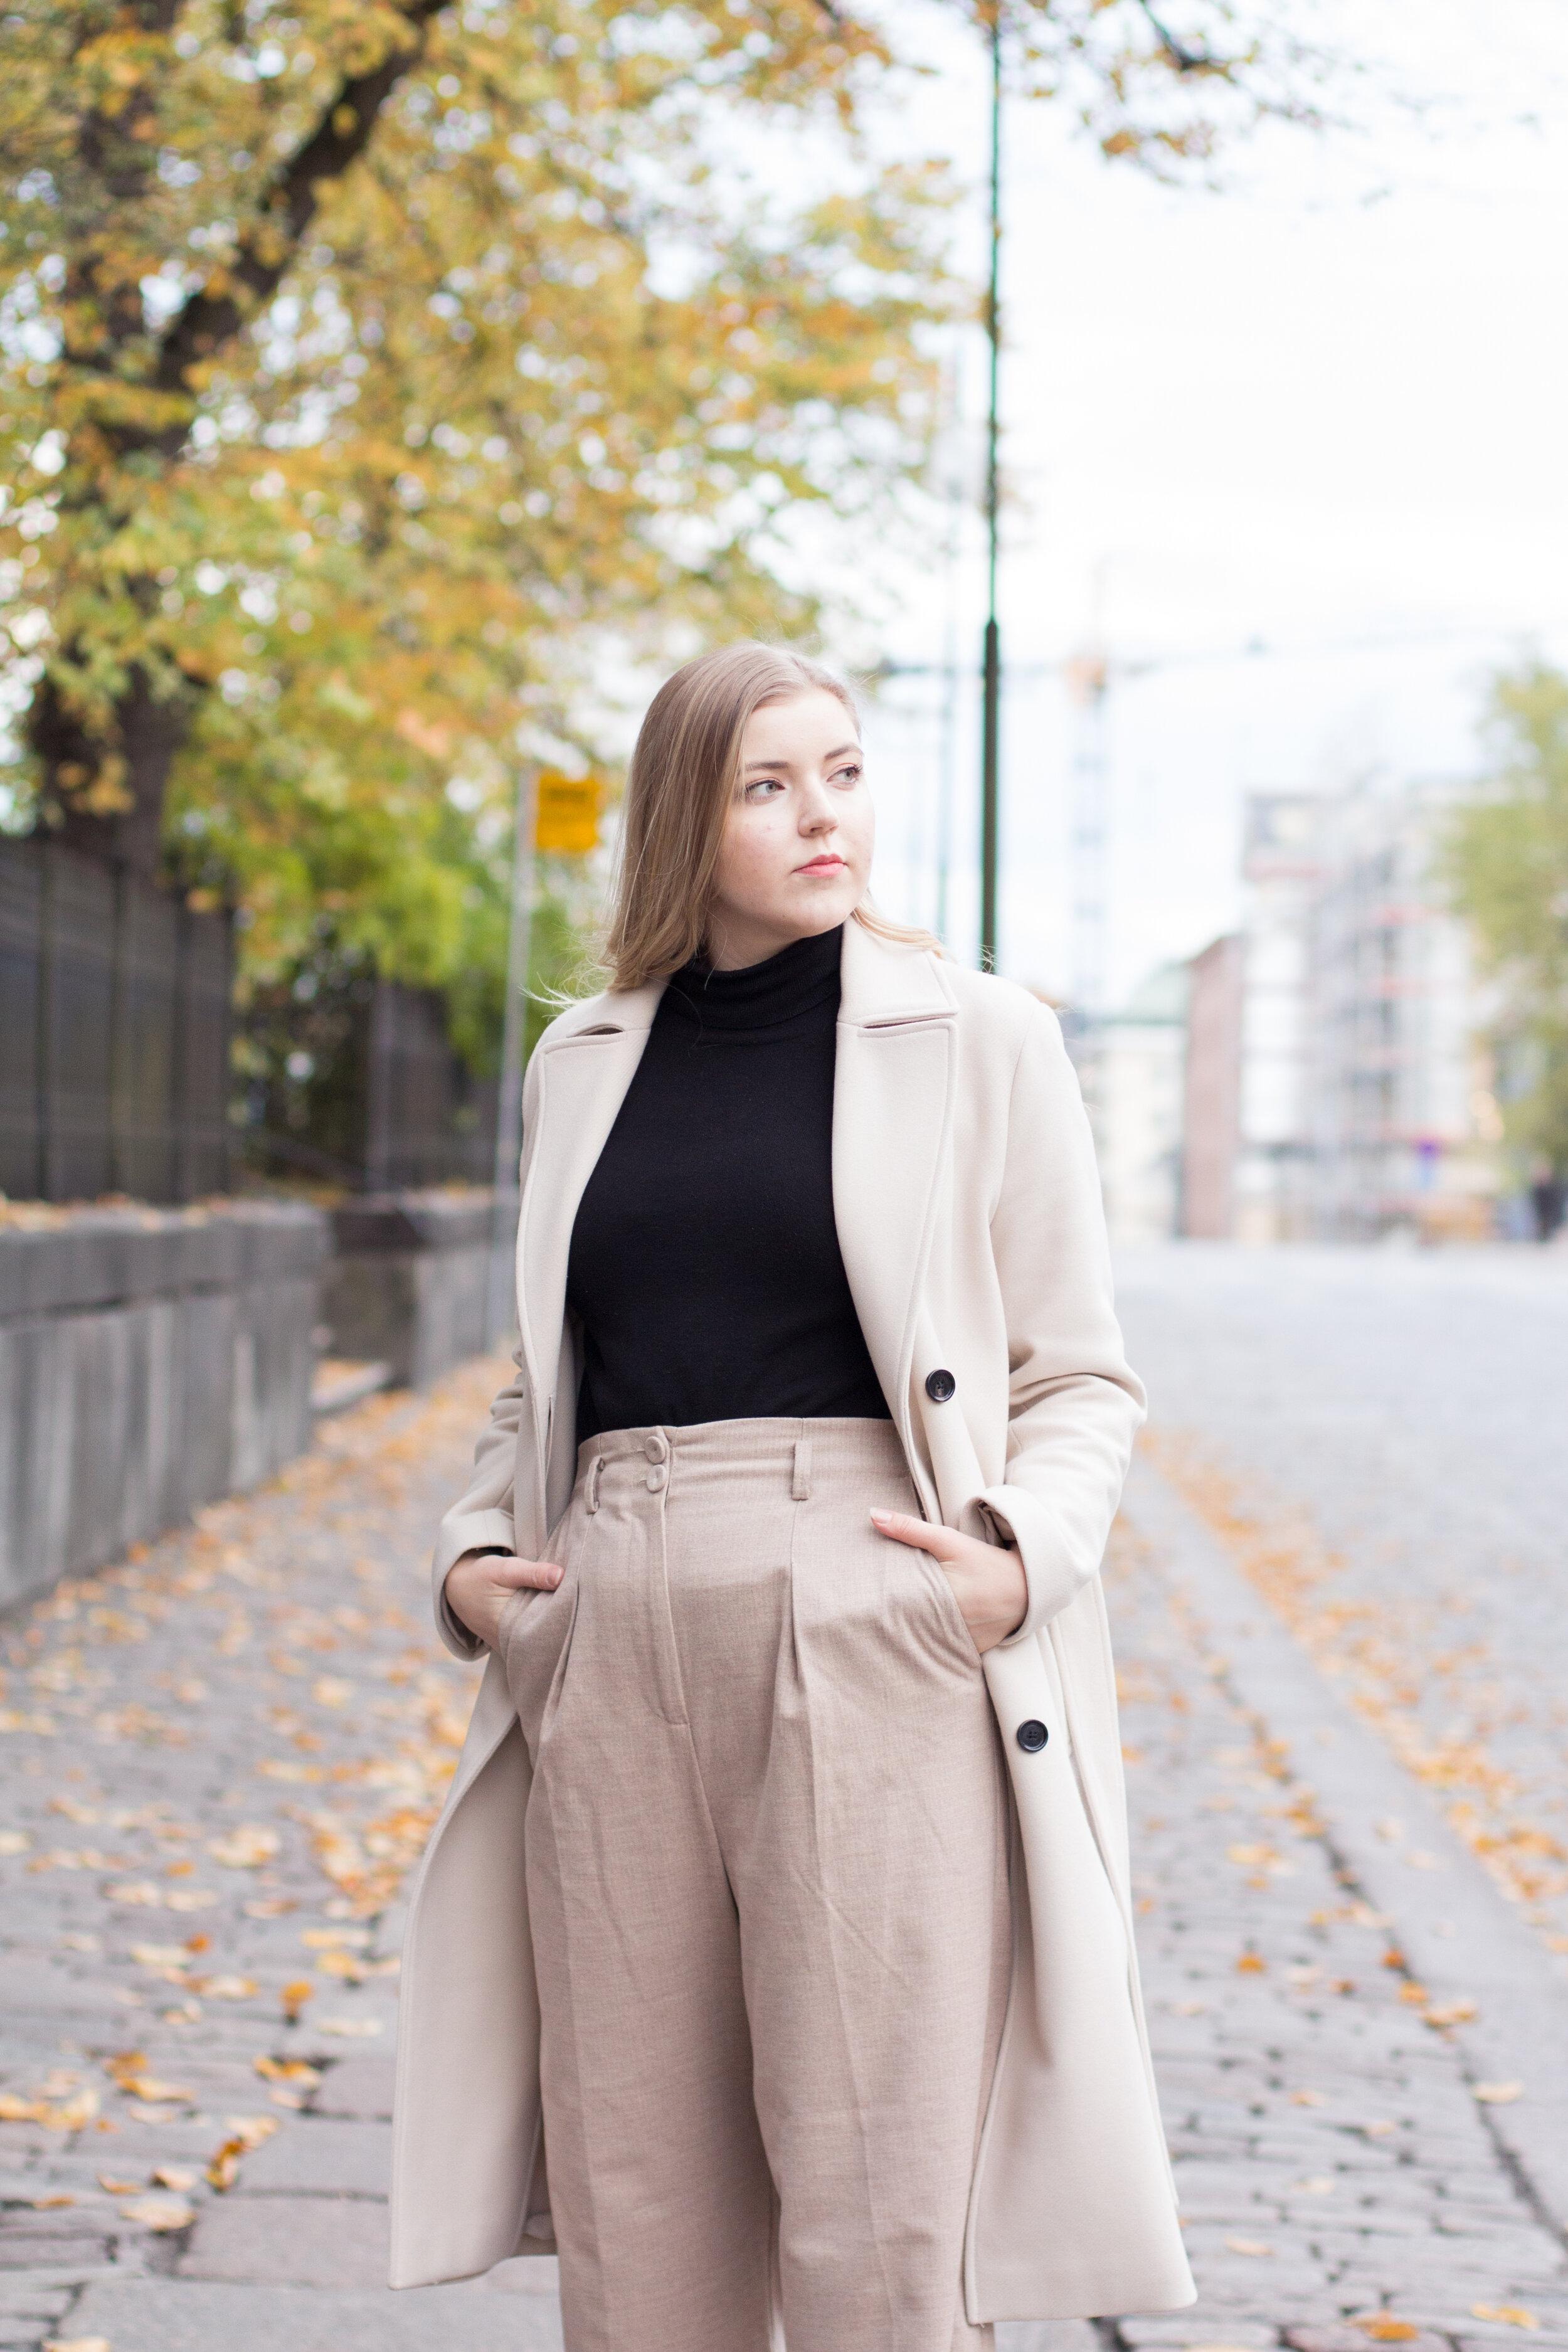 Beige coat outfit girl photo 2.jpg